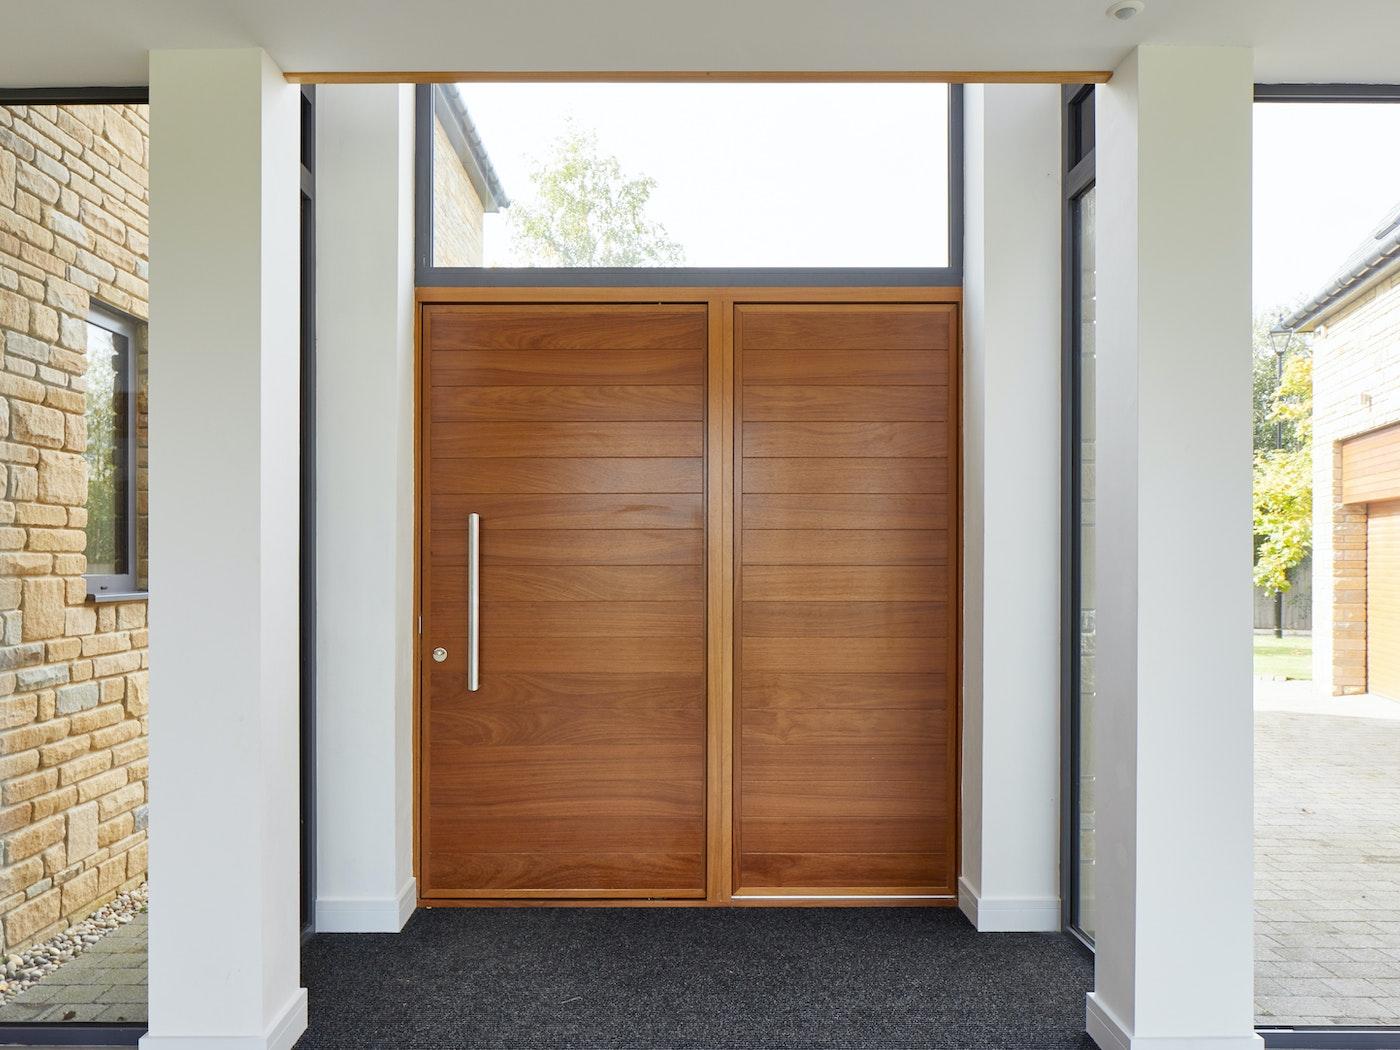 Parma e80 pivot | iroko | wood side panel | option 8 handle